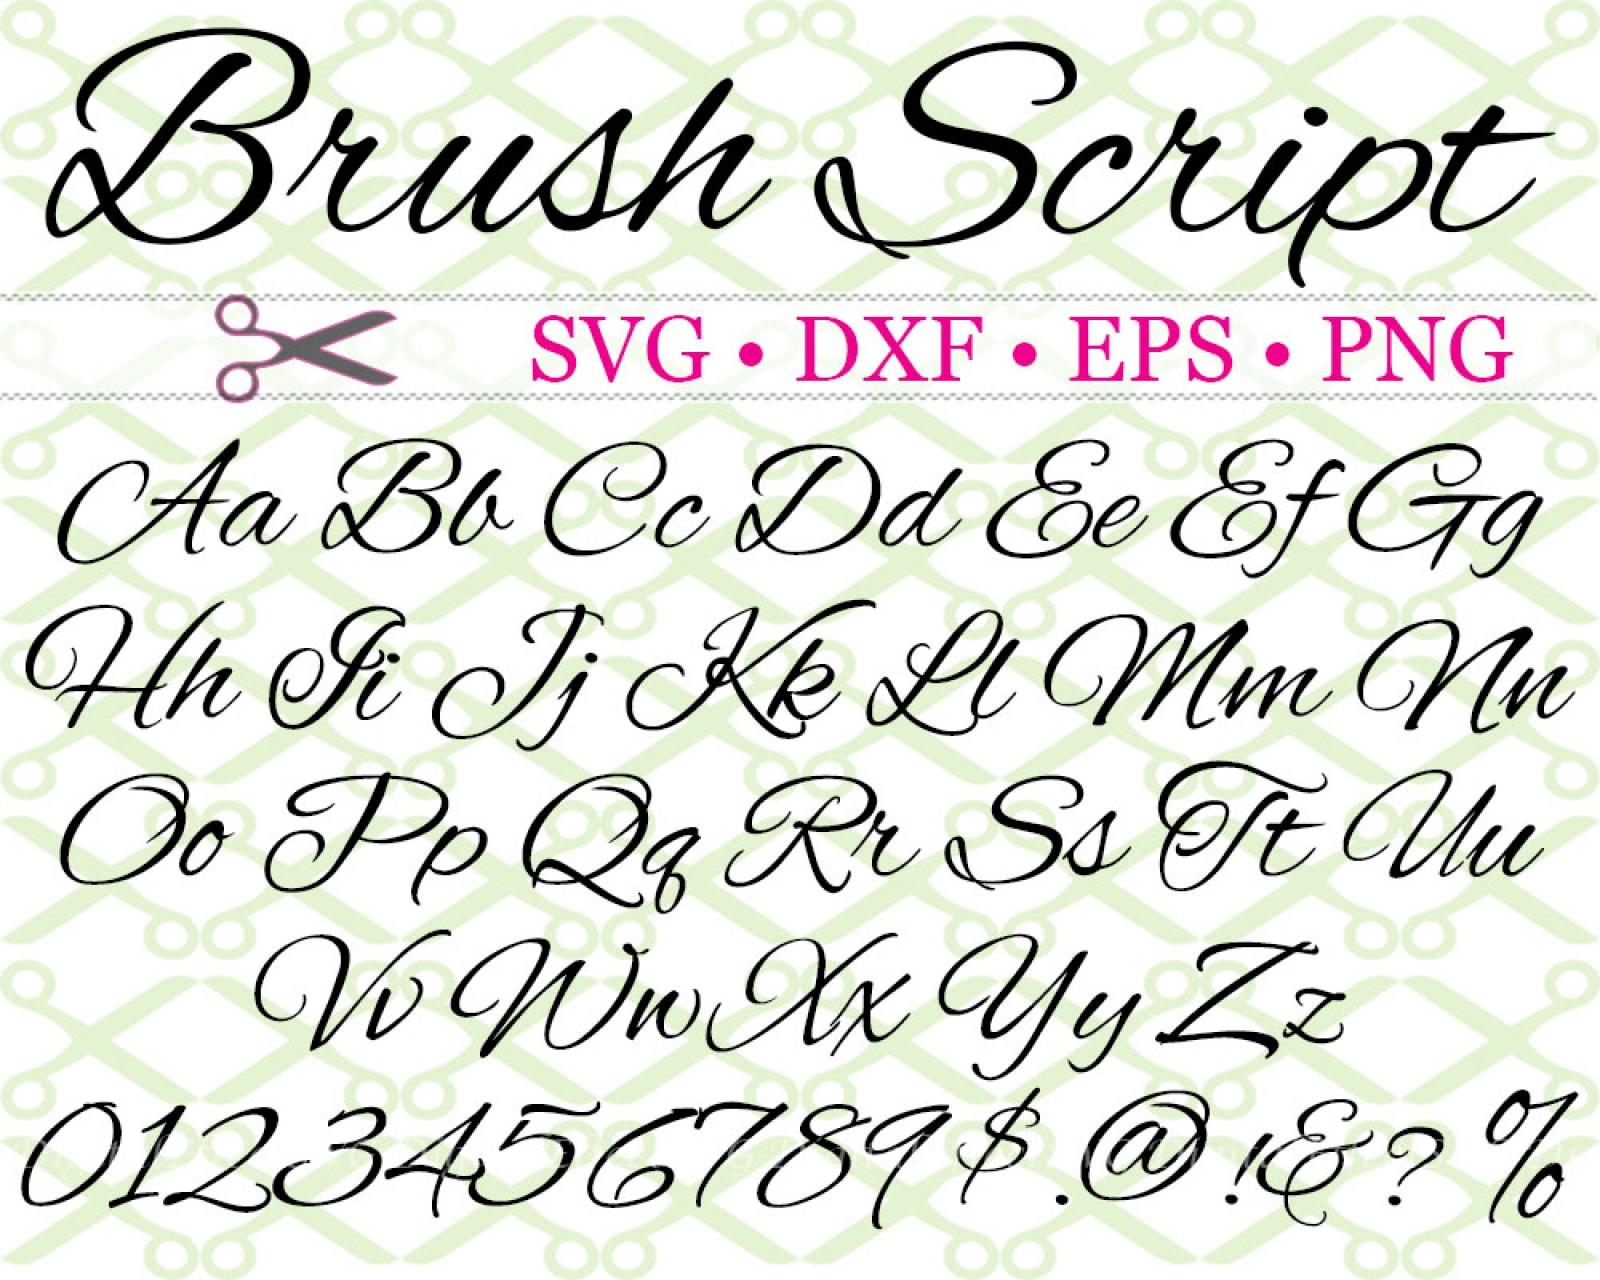 Download BRISH SCRIPT SVG FONT-Cricut & Silhouette Files SVG DXF ...